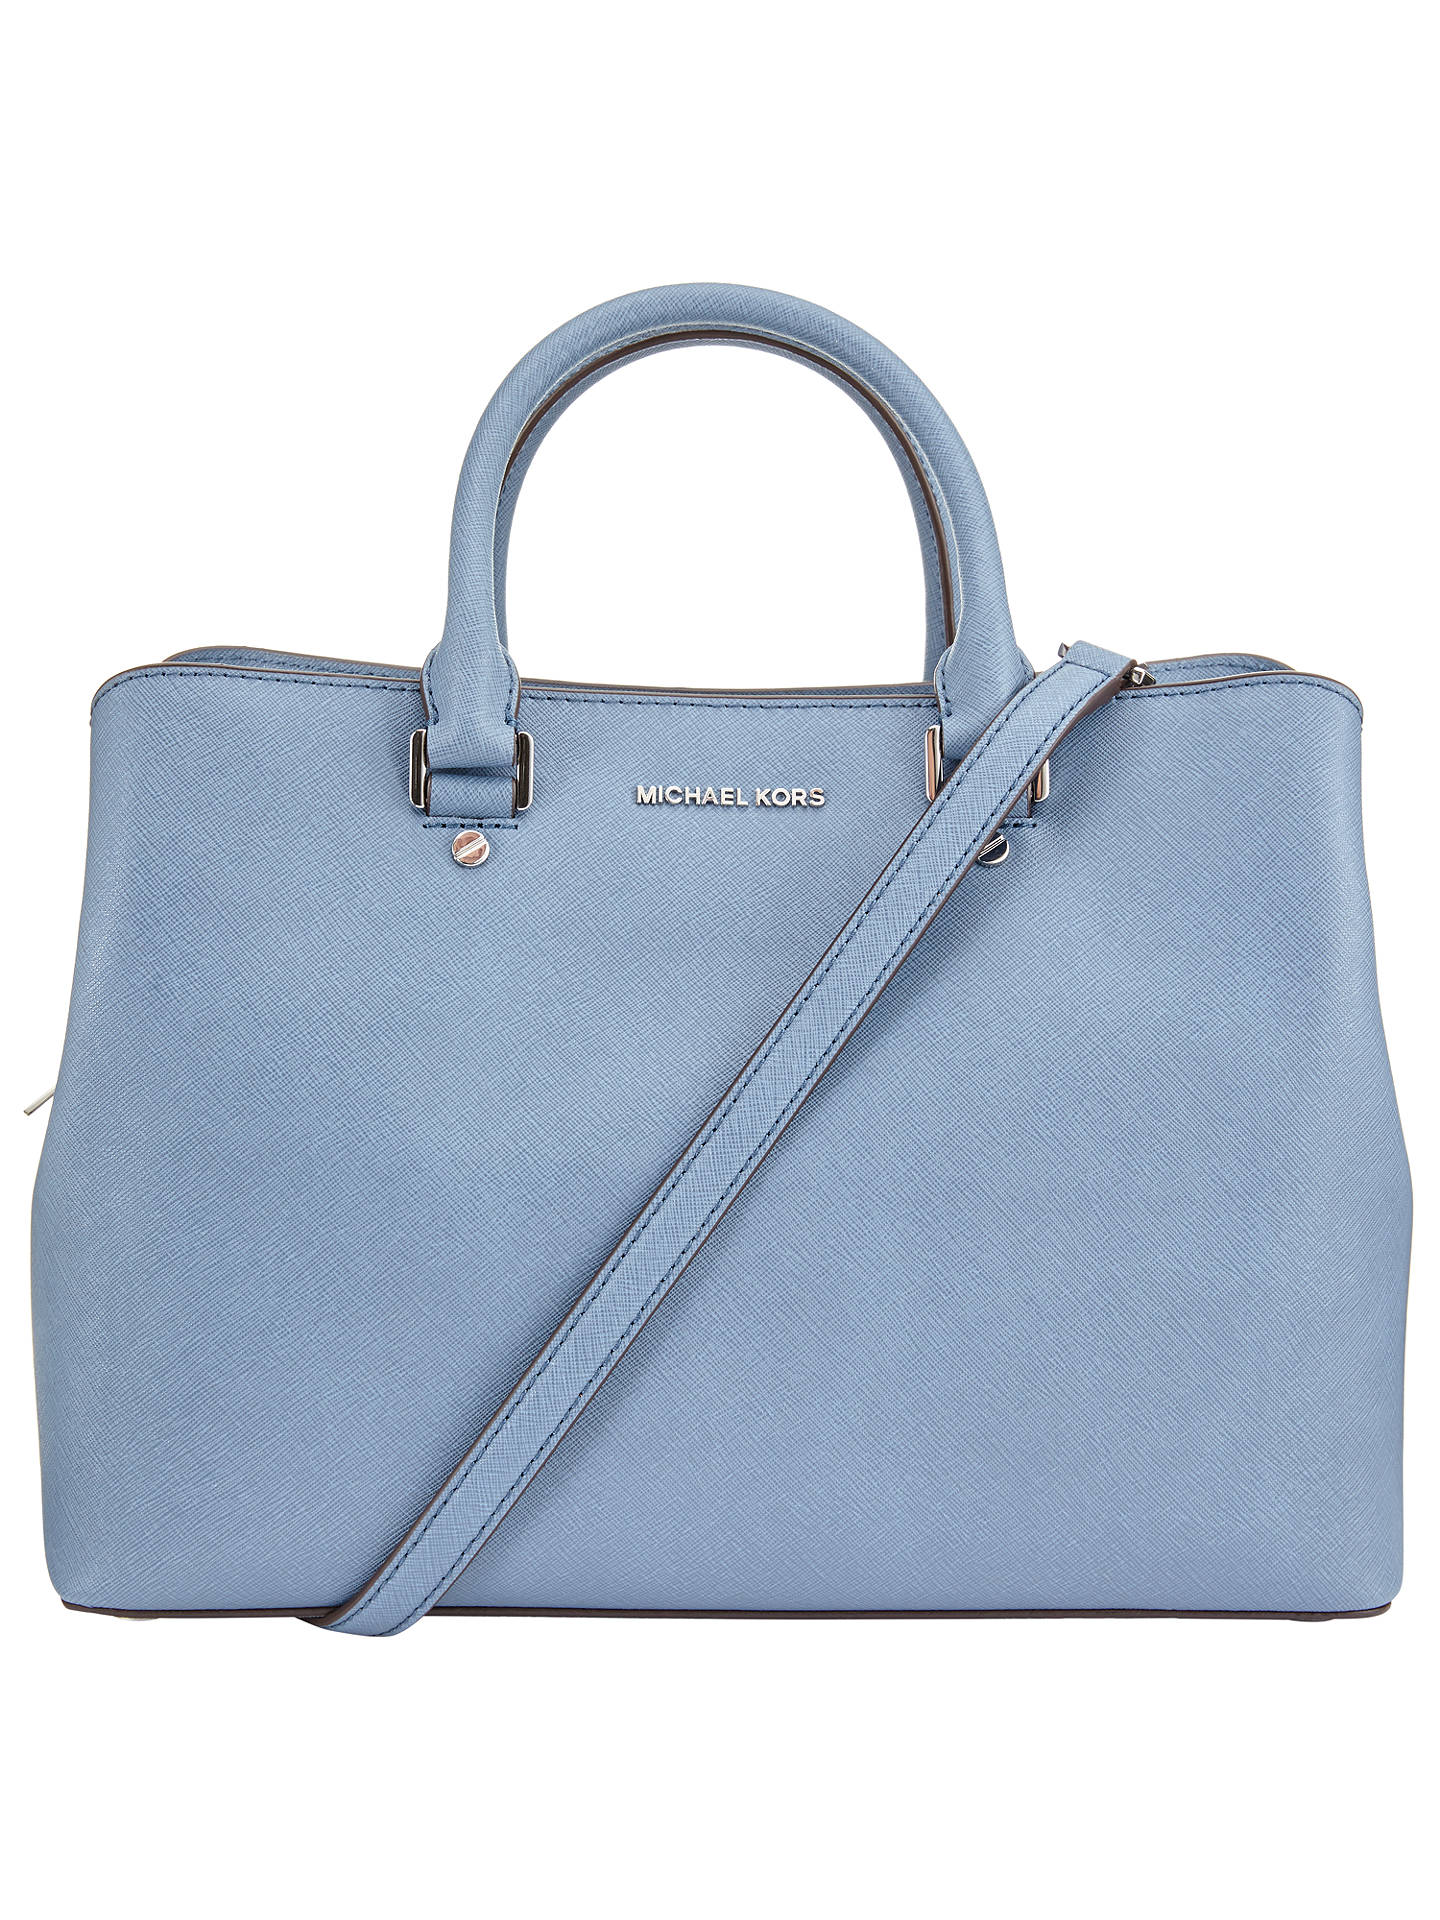 3a71cc9045db Buy MICHAEL Michael Kors Savannah Large Leather Satchel, Denim Online at  johnlewis.com ...